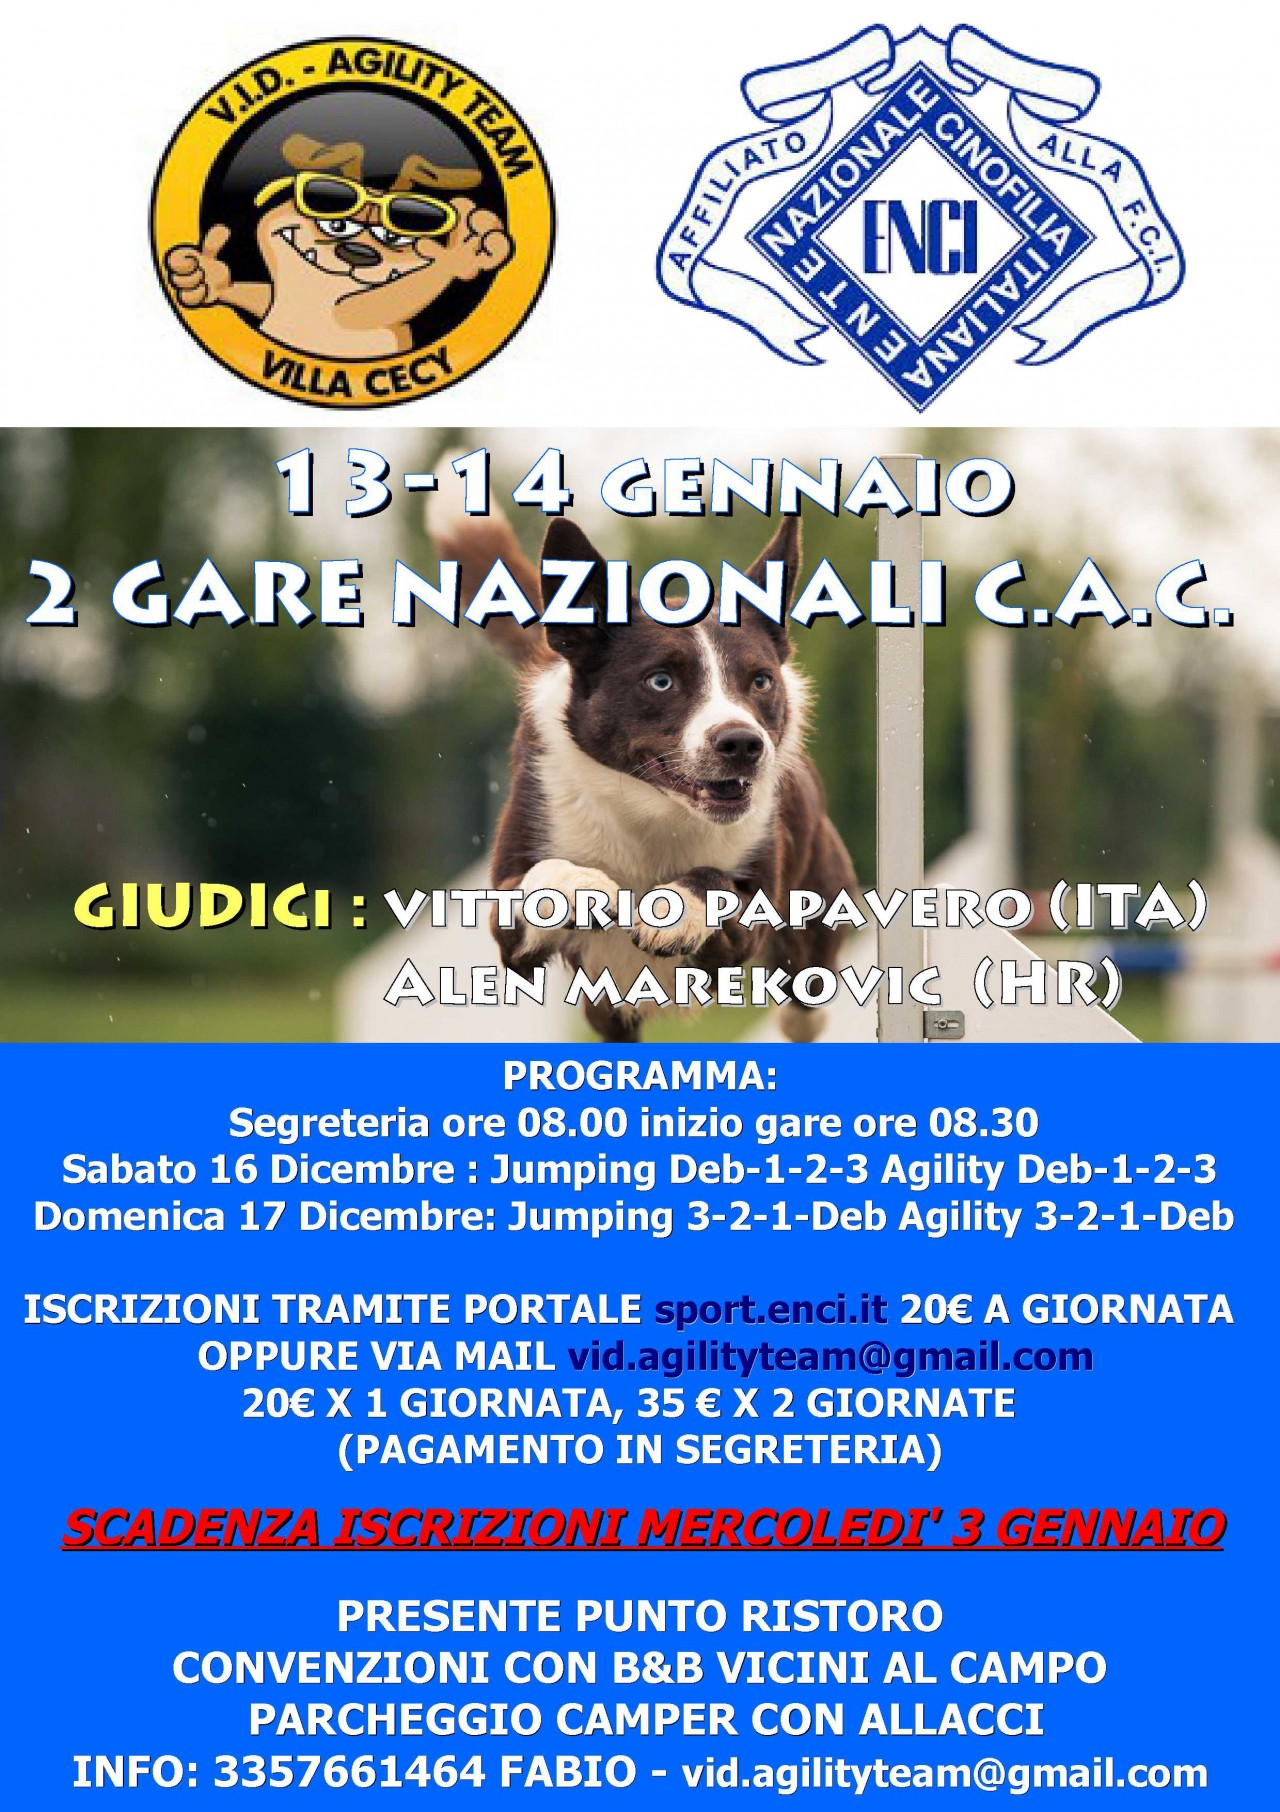 GARA NAZIONALE C.A.C. SABATO 13 GENNAIO